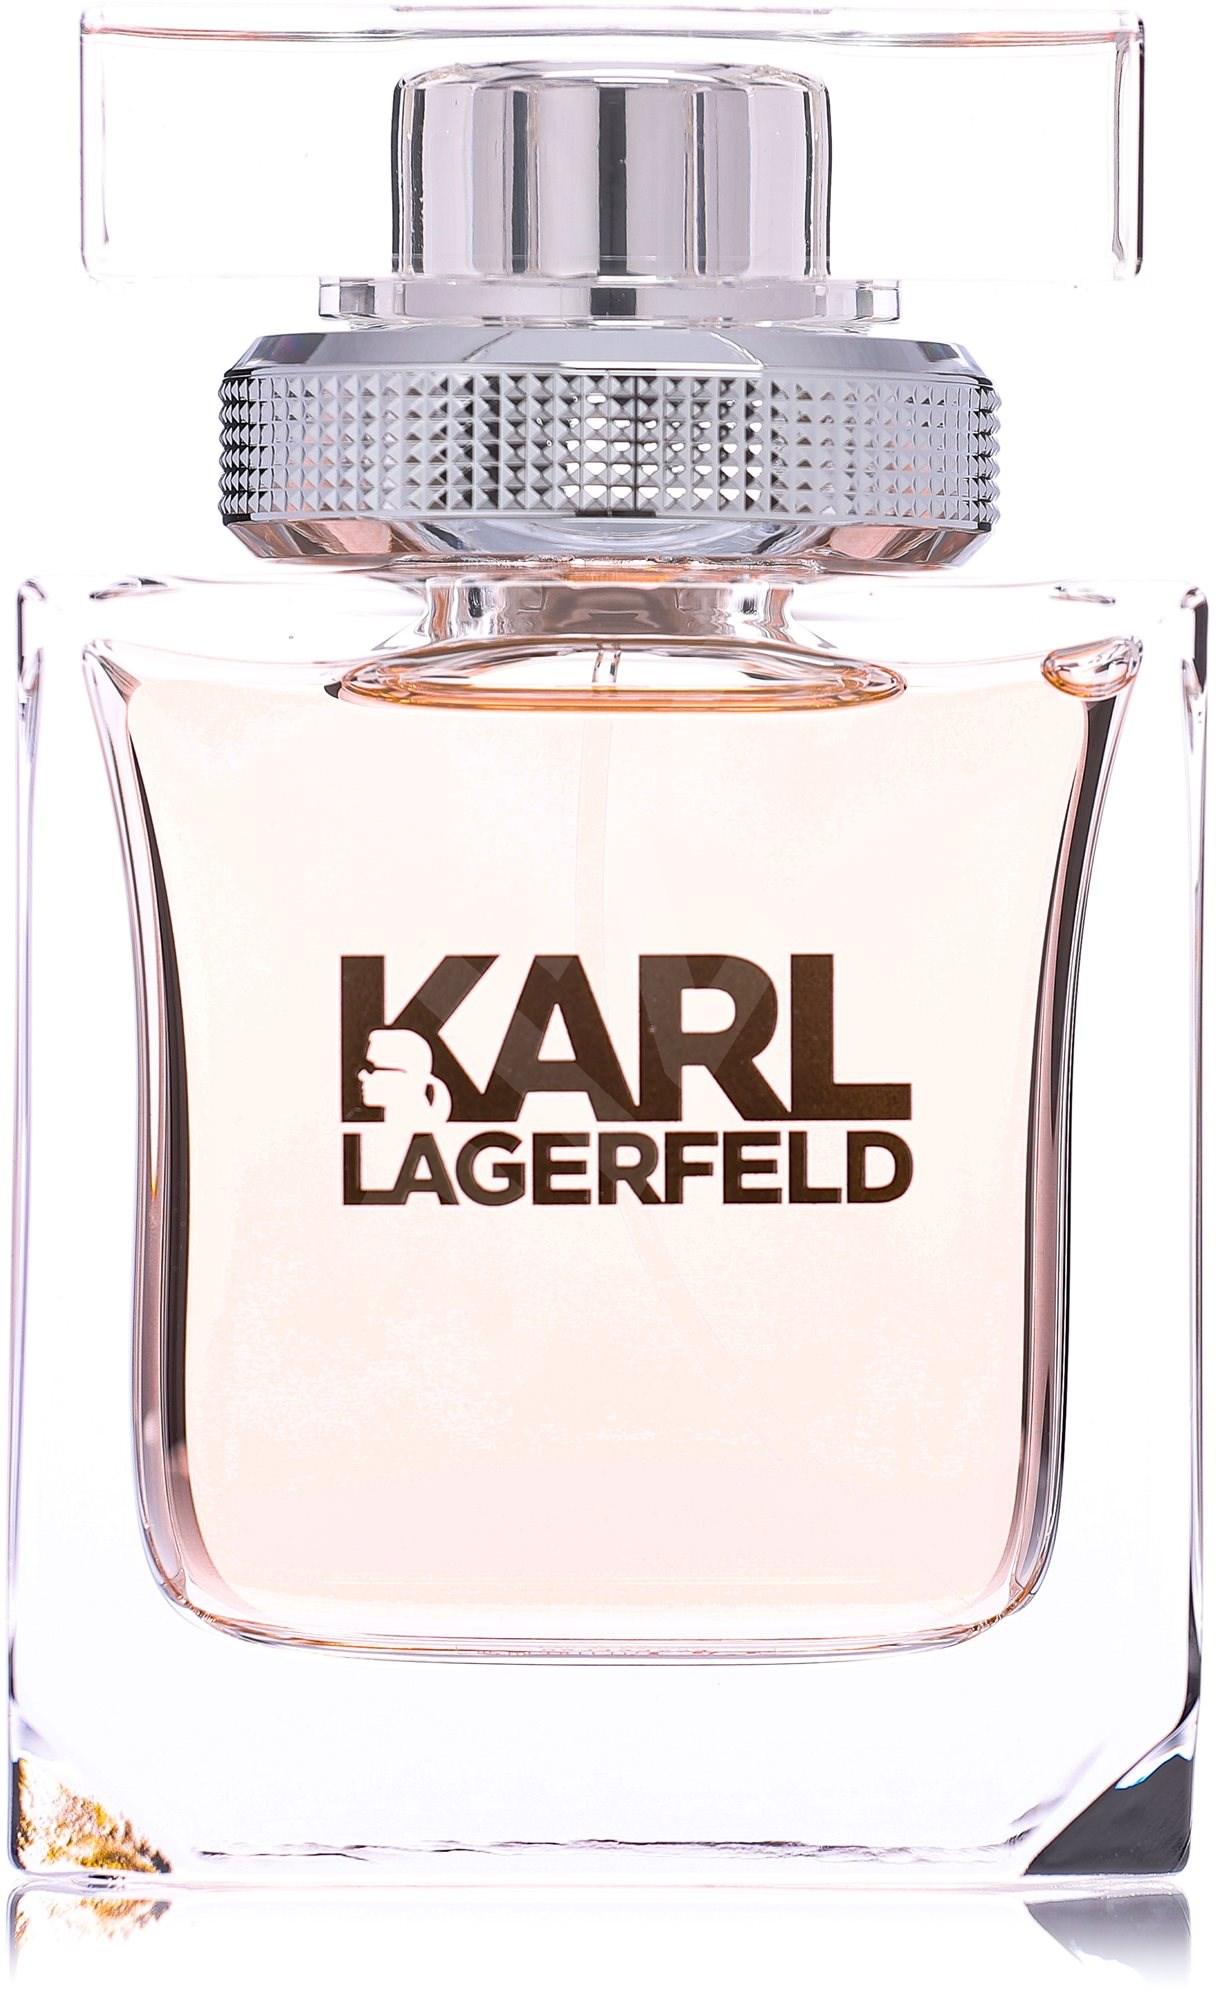 lagerfeld karl lagerfeld for her 85 ml eau de parfum. Black Bedroom Furniture Sets. Home Design Ideas